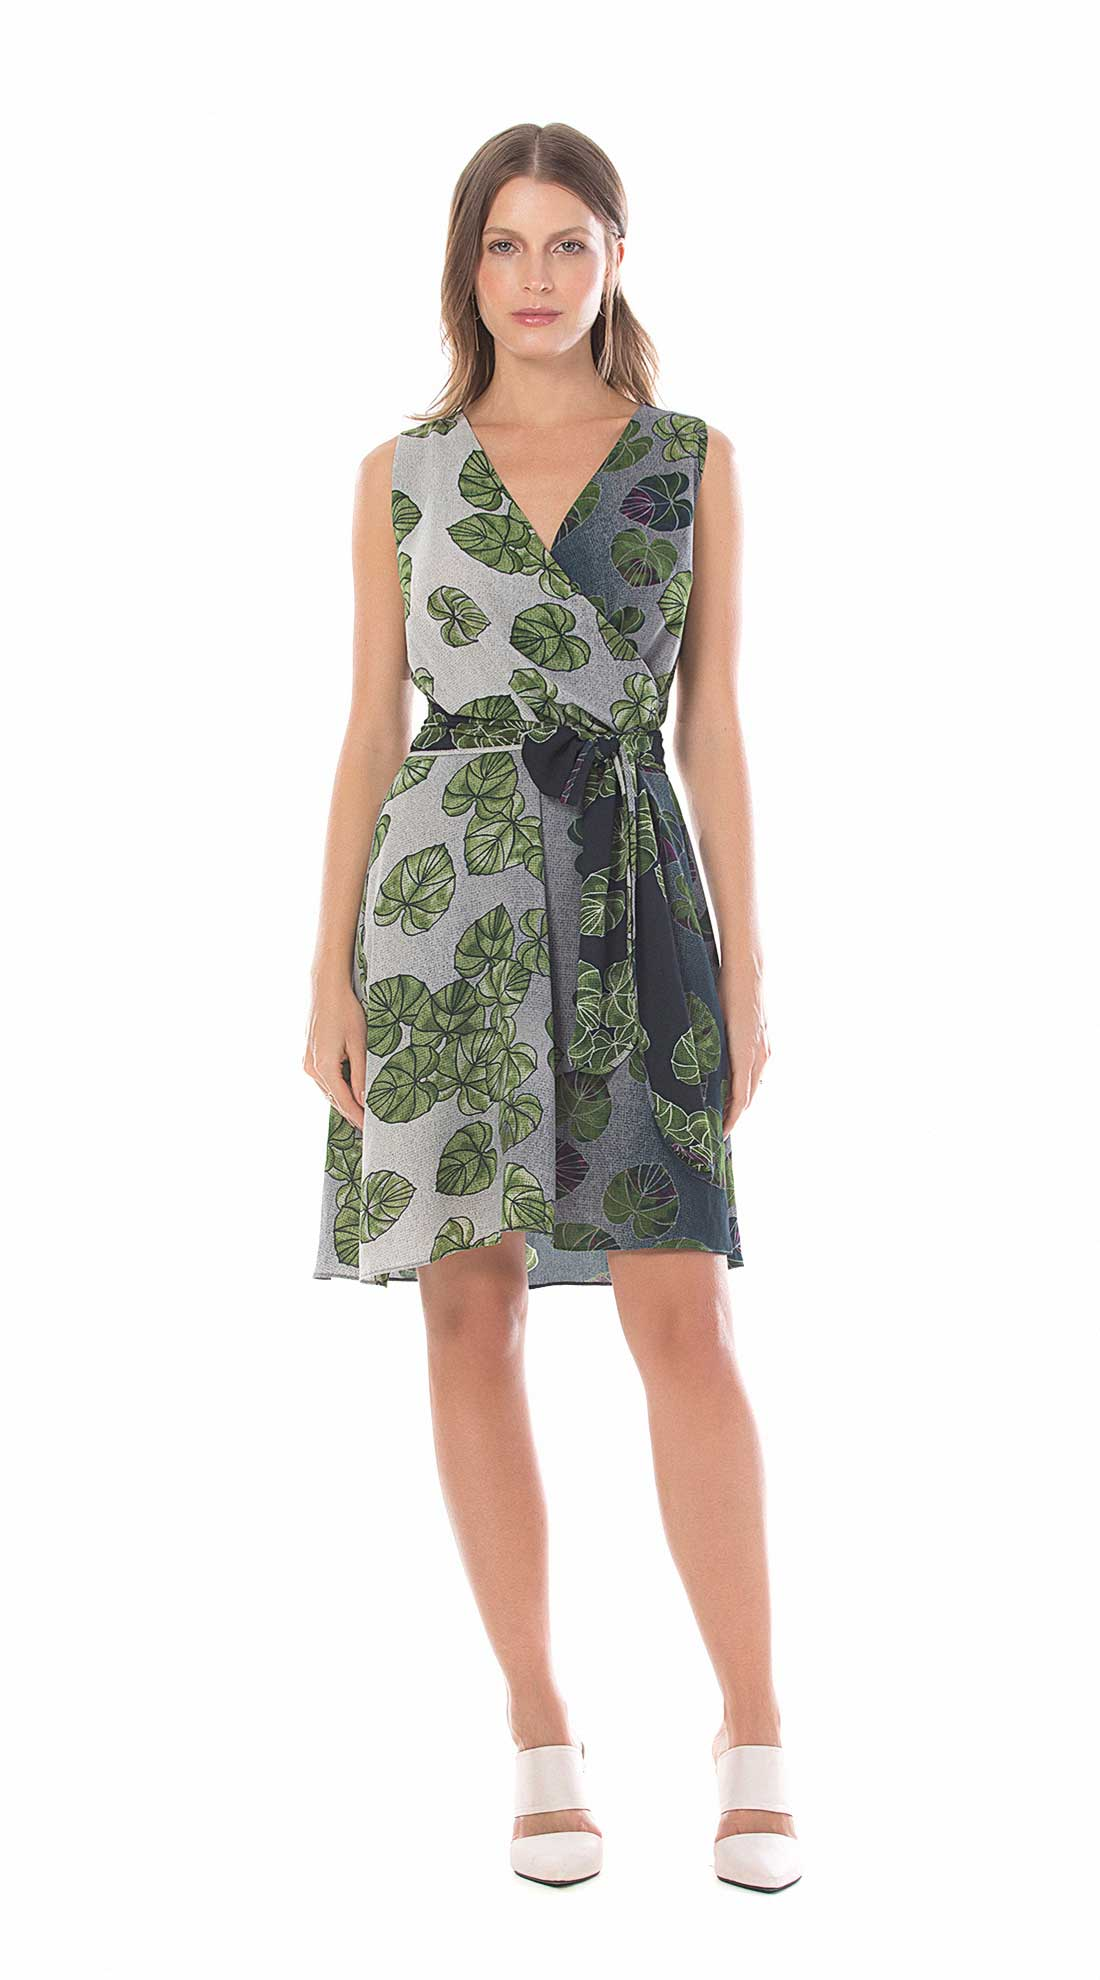 55debee0f8 Vestido Curto Decote Transpassado Com Faixa Verde - Maria Valentina